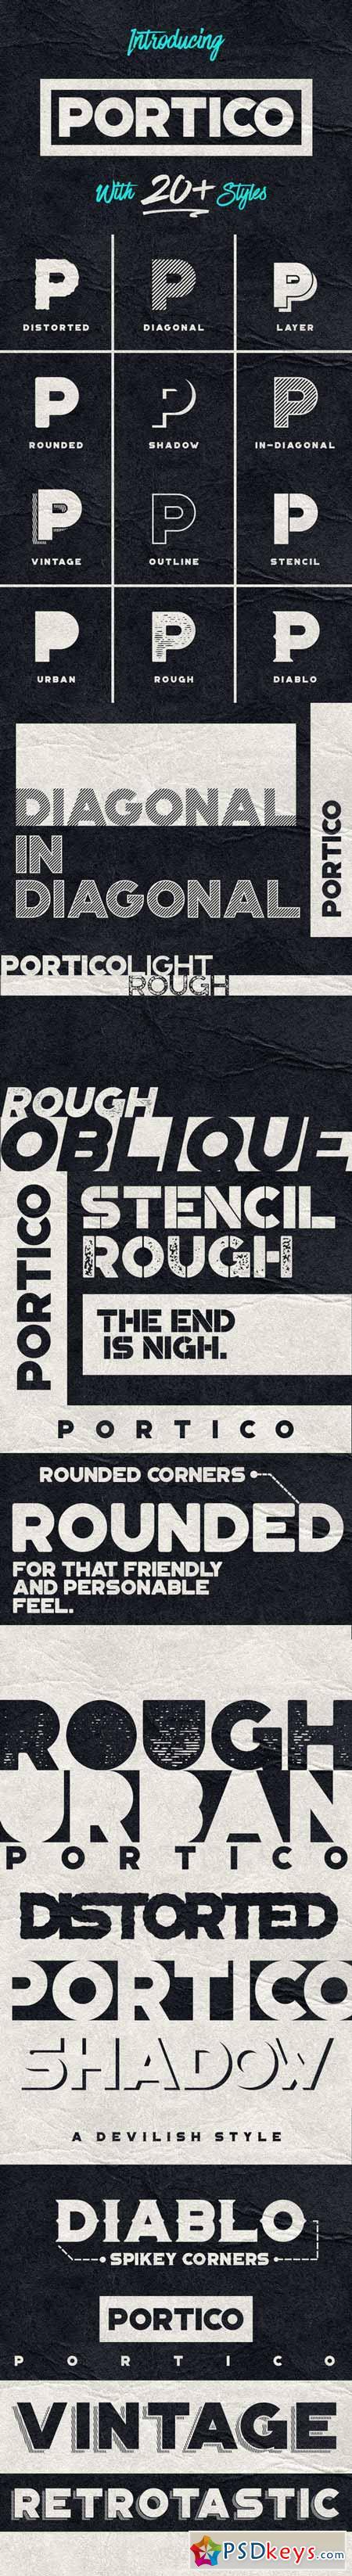 Portico Typeface 380581